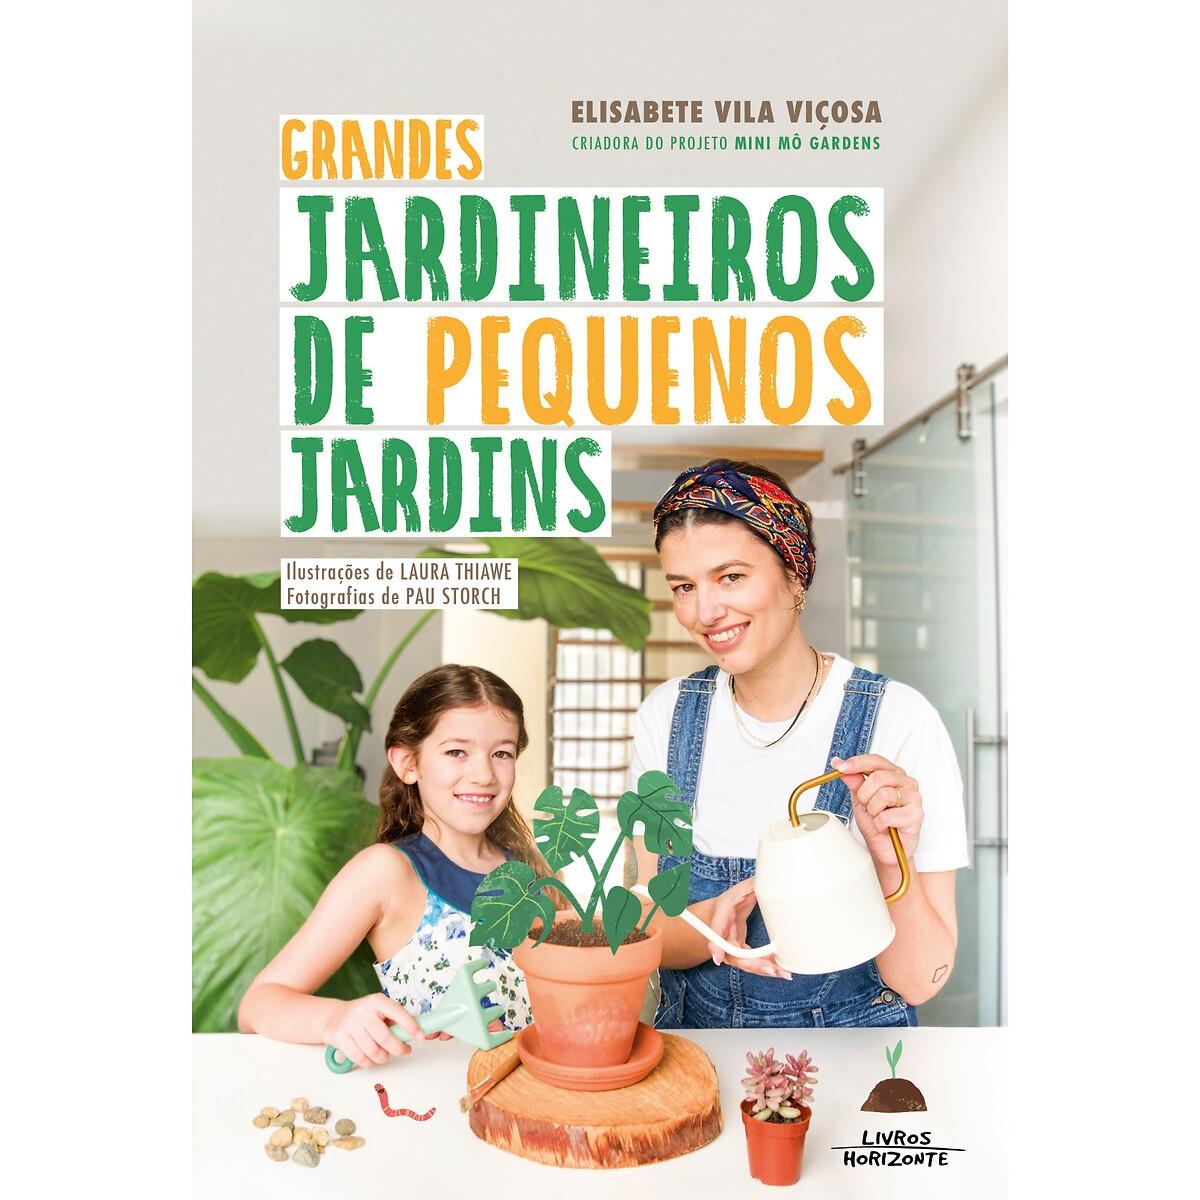 LIVROS HORIZONTE - Livros Horizonte Livro Grandes Jardineiros de Pequenos Jardins